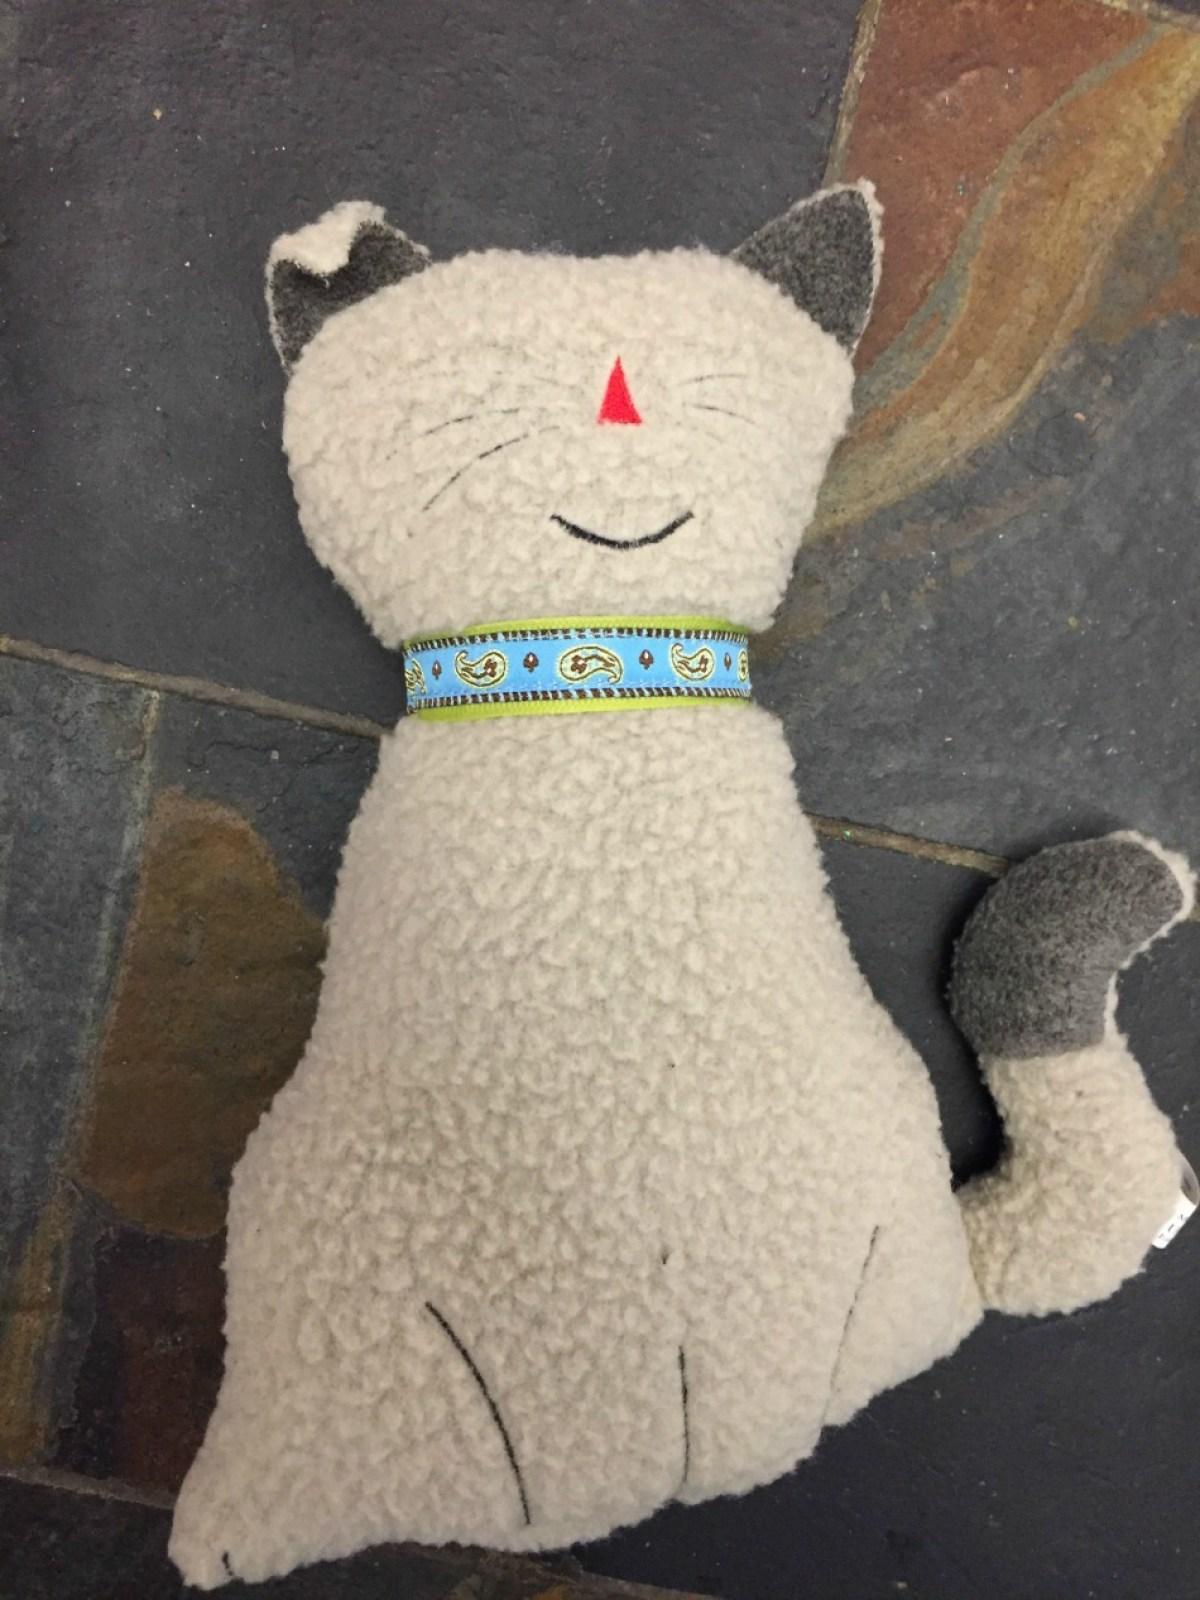 sitting cuddle cat, dog toy